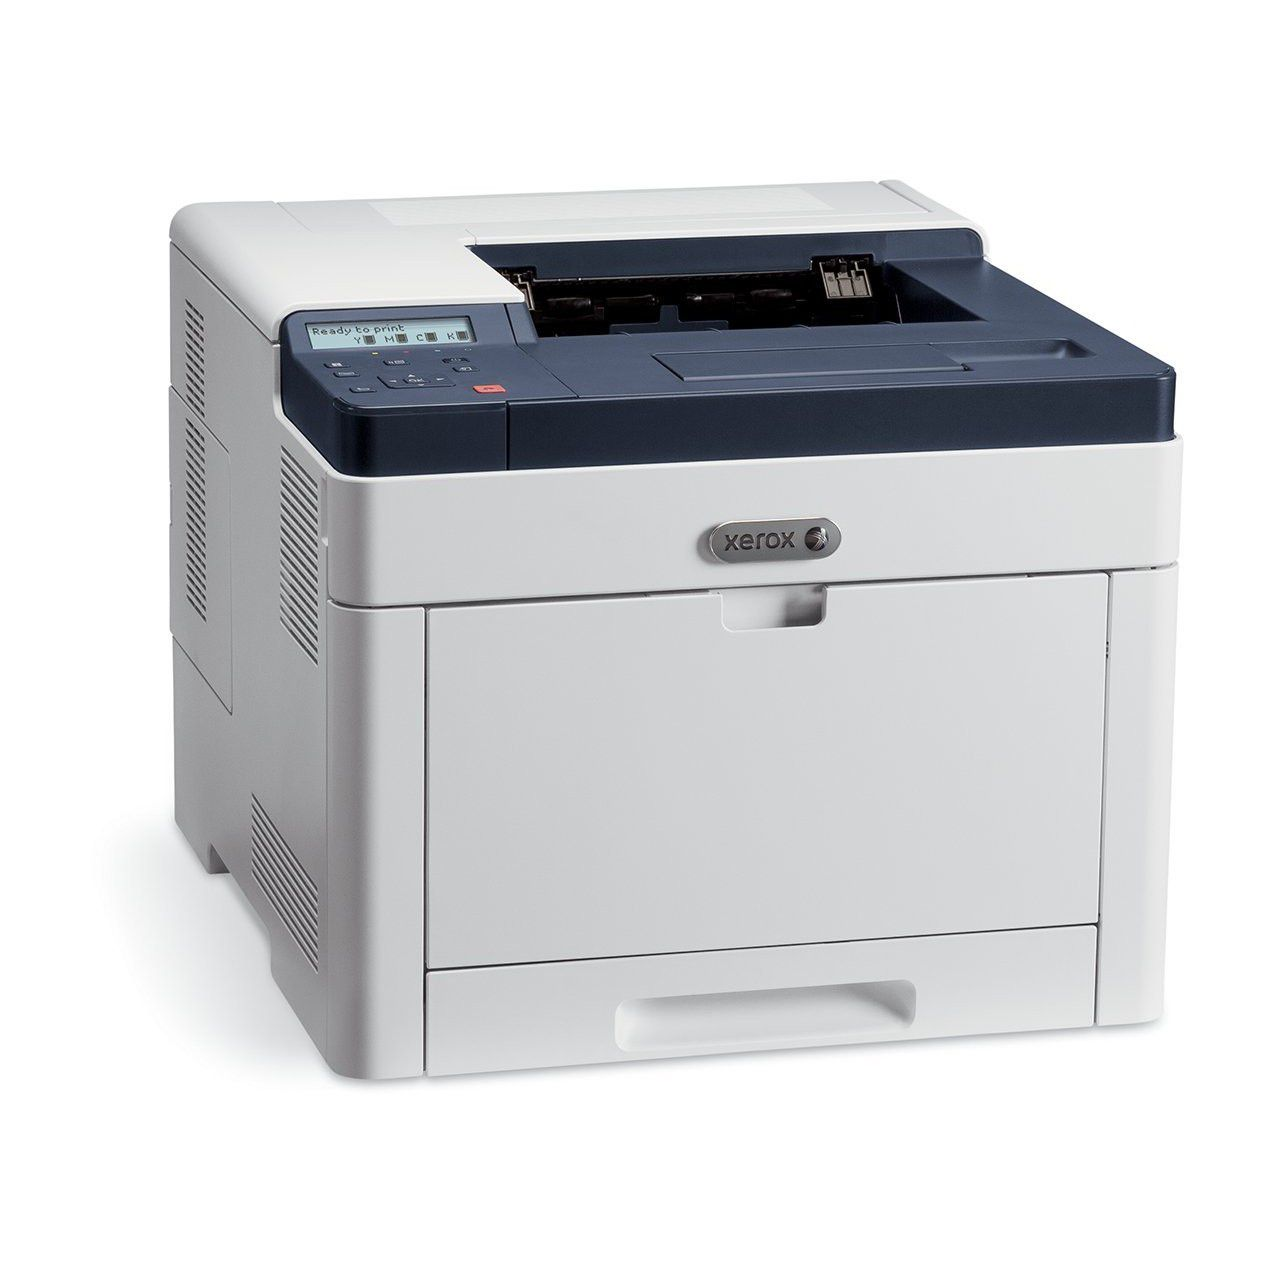 XEROX PHASER 6510/DN